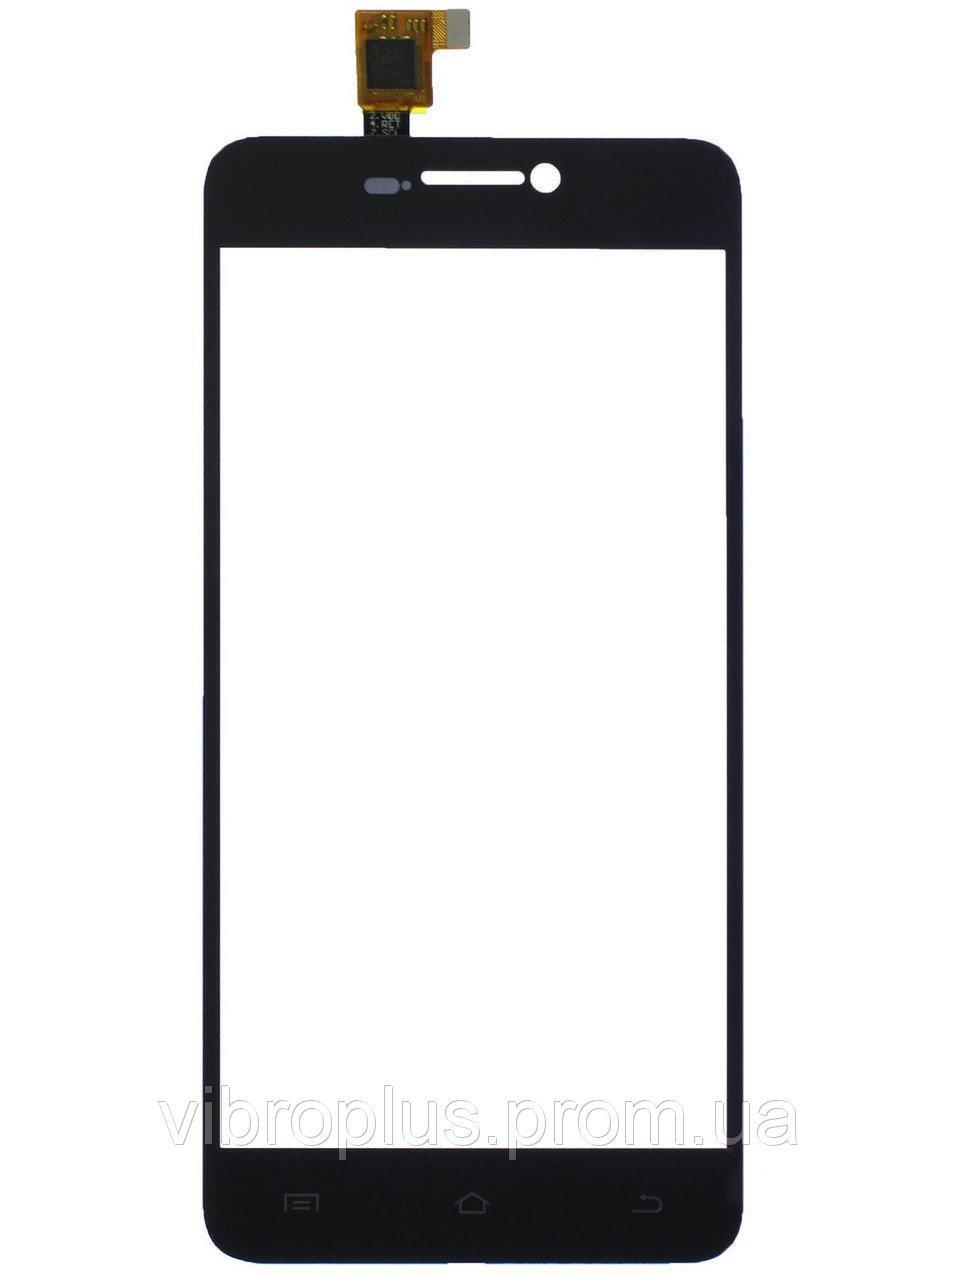 Сенсор (Touch screen) Bravis Tau чёрный